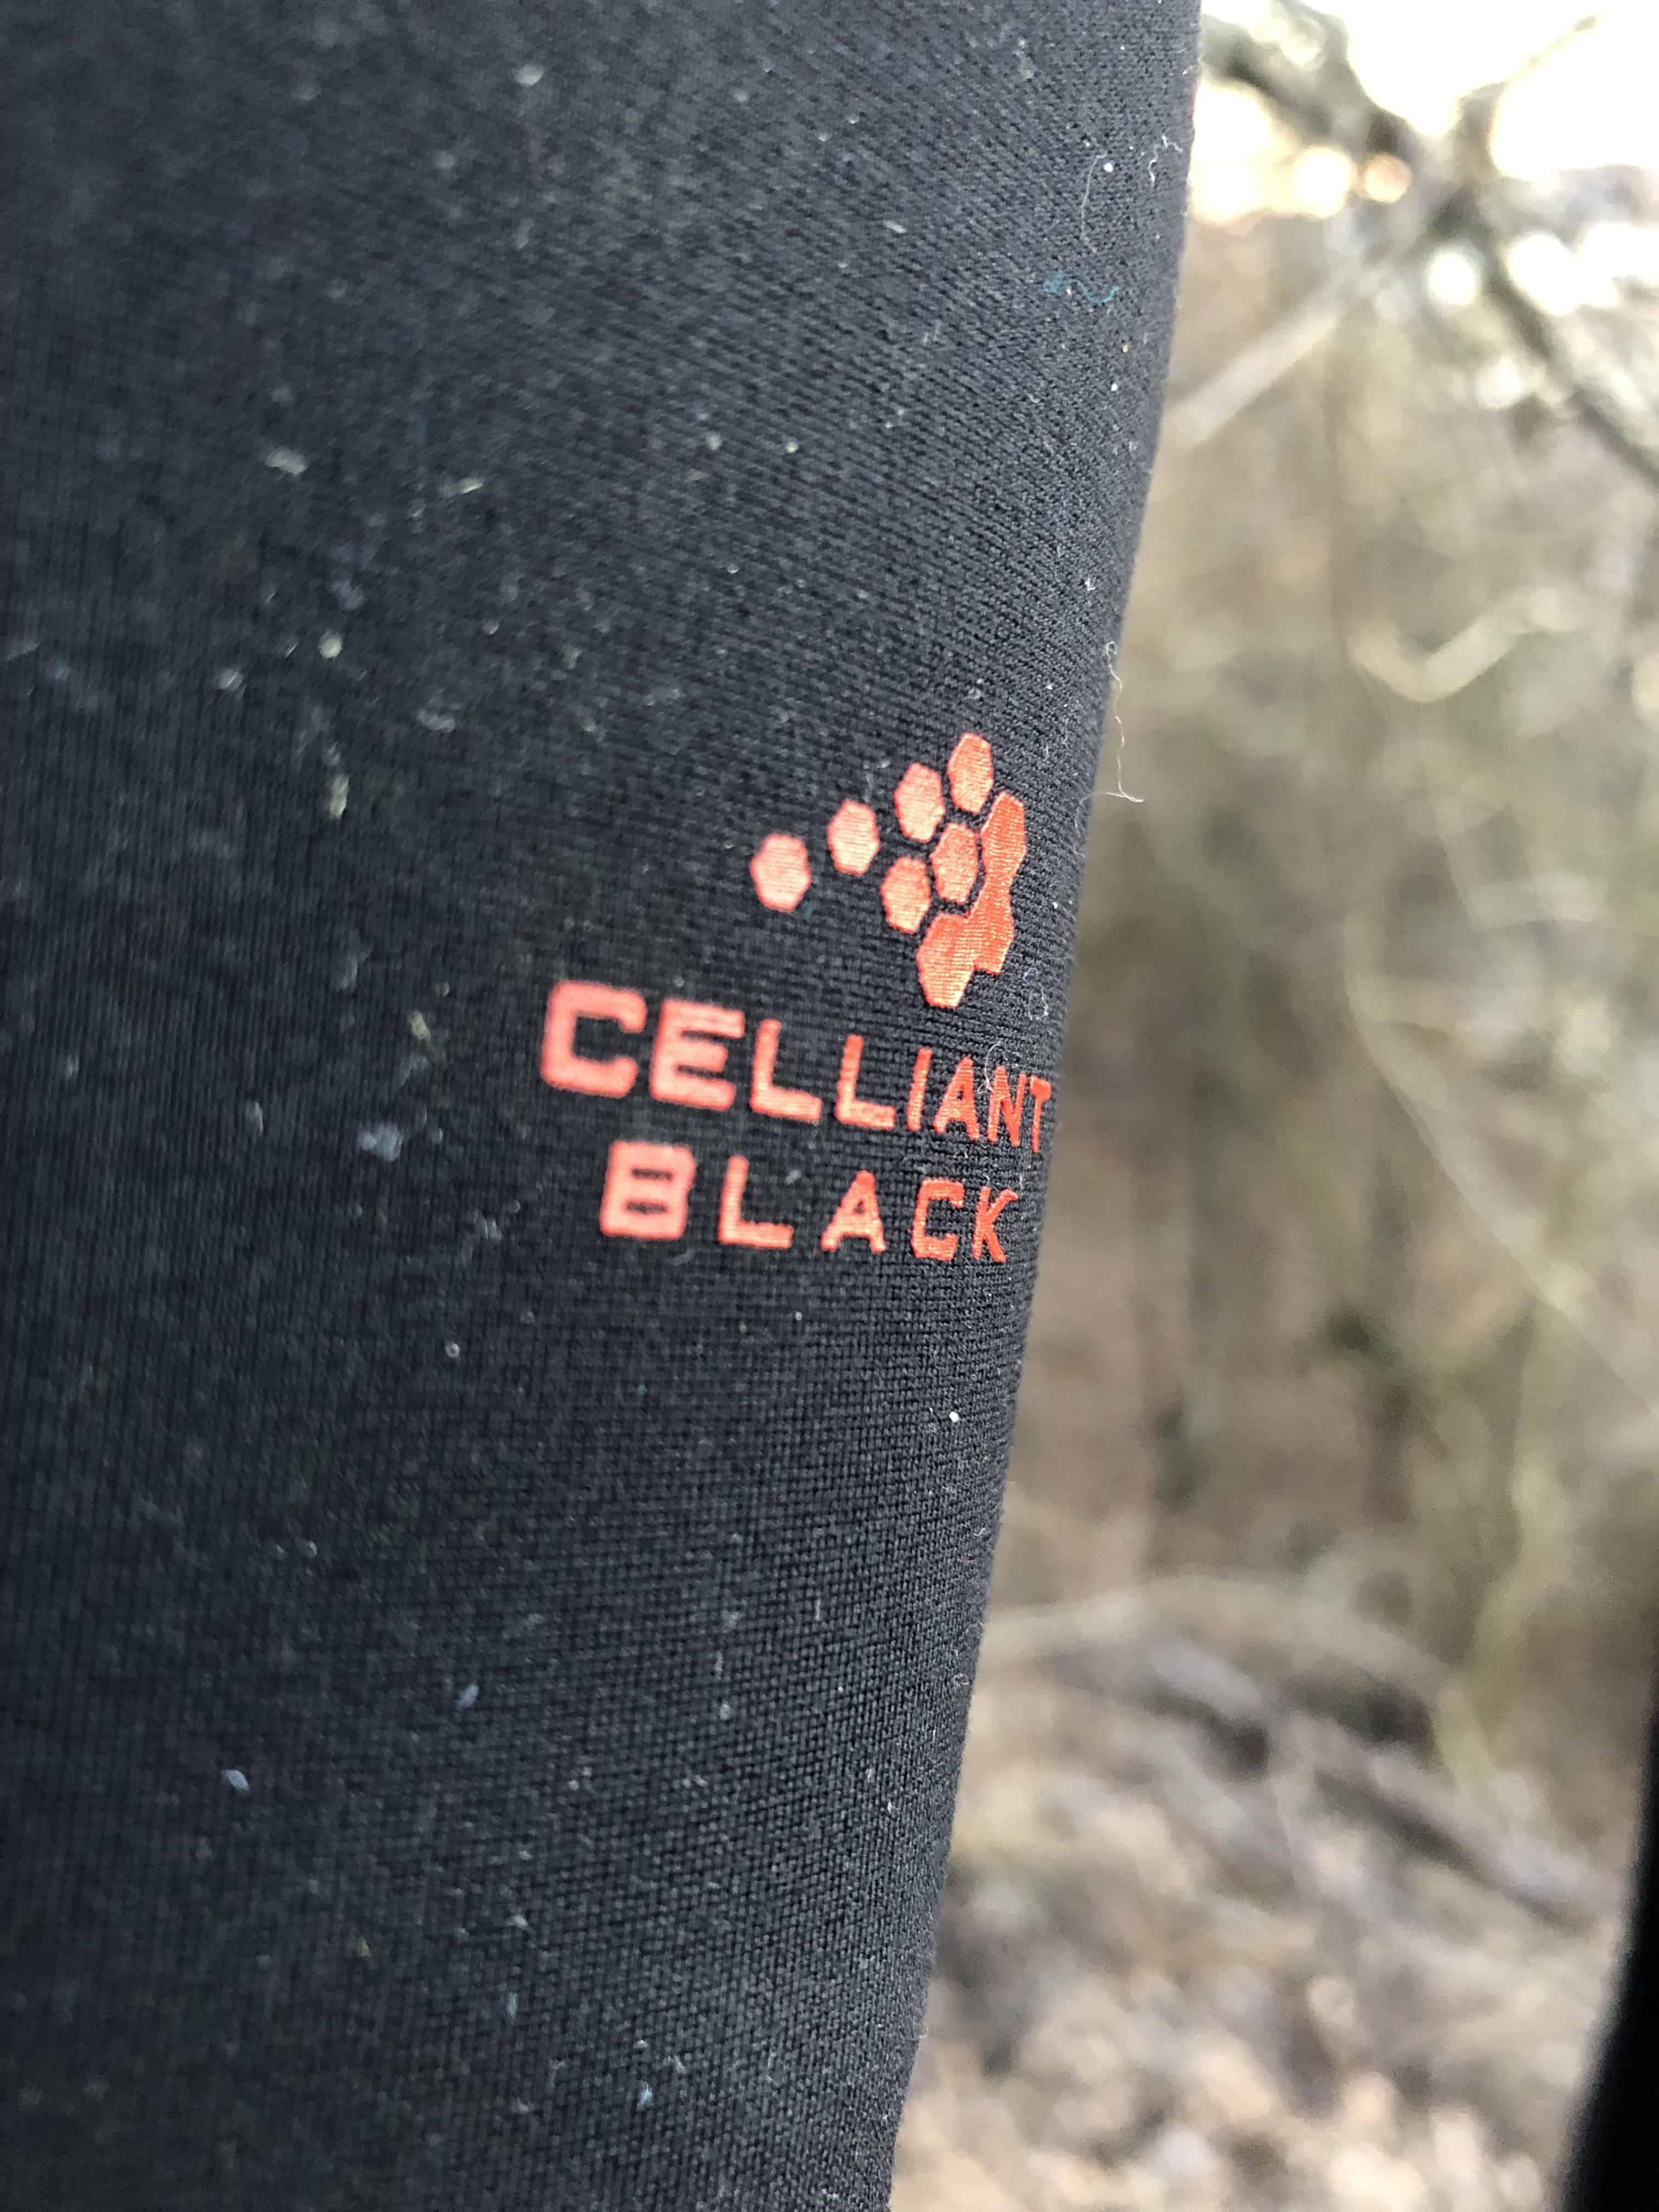 Xcel drylock celliant black